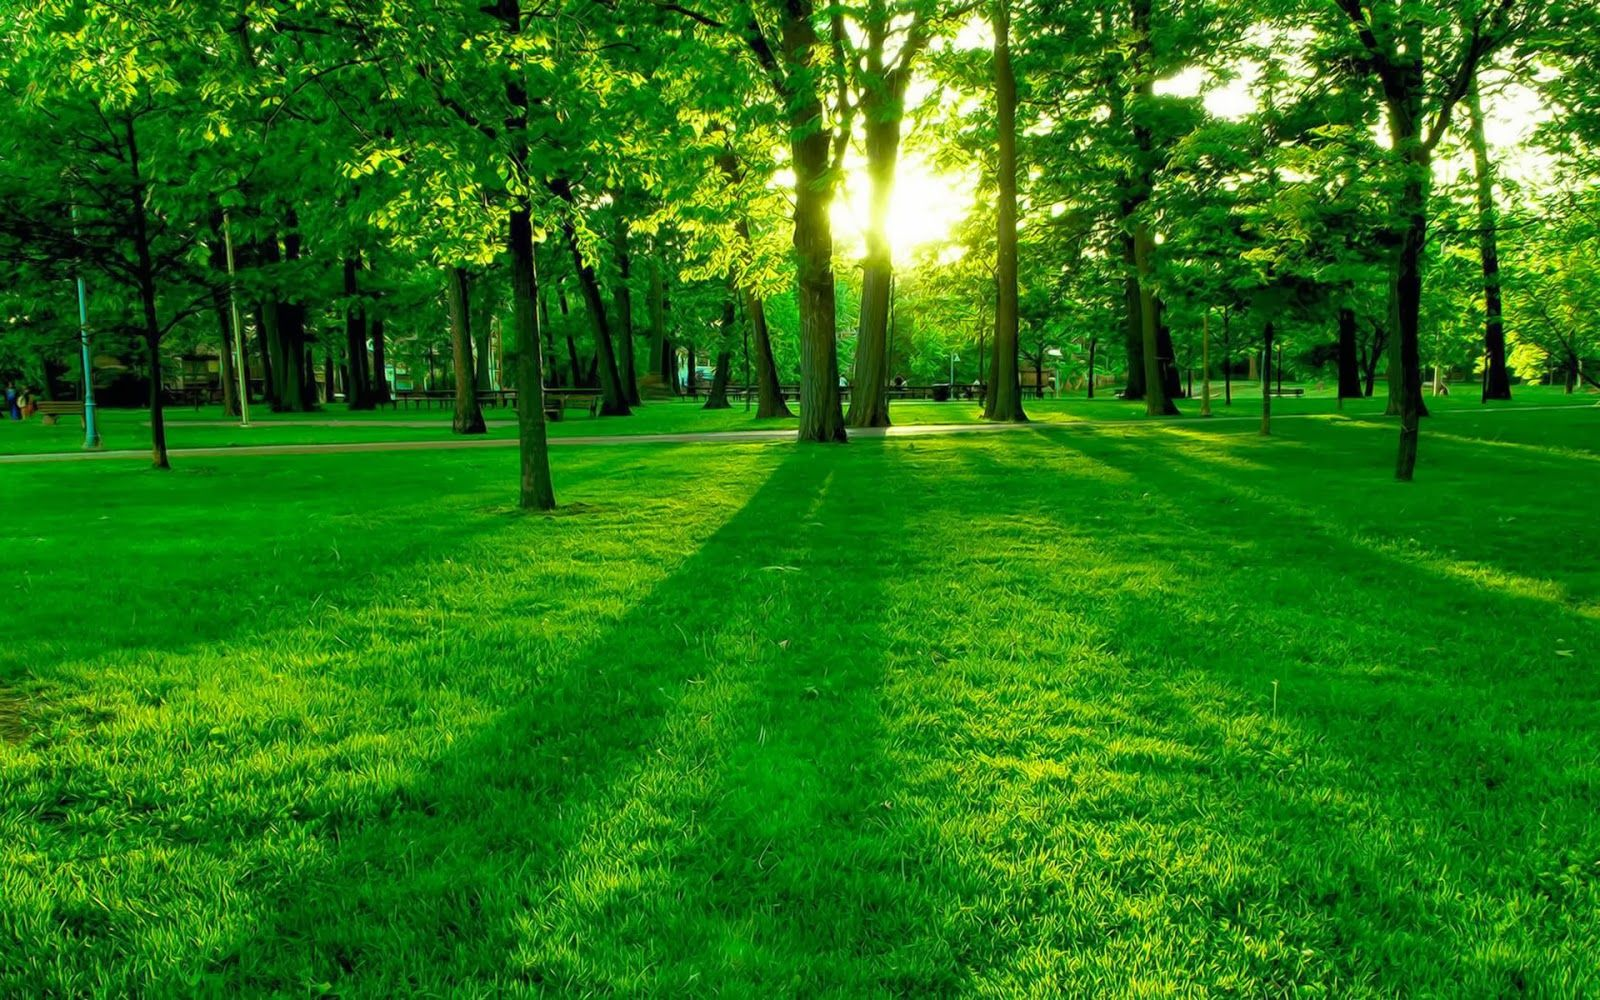 Most Beautiful Green Nature Google Search Green Nature Wallpaper Hd Nature Wallpapers Beautiful Nature Wallpaper